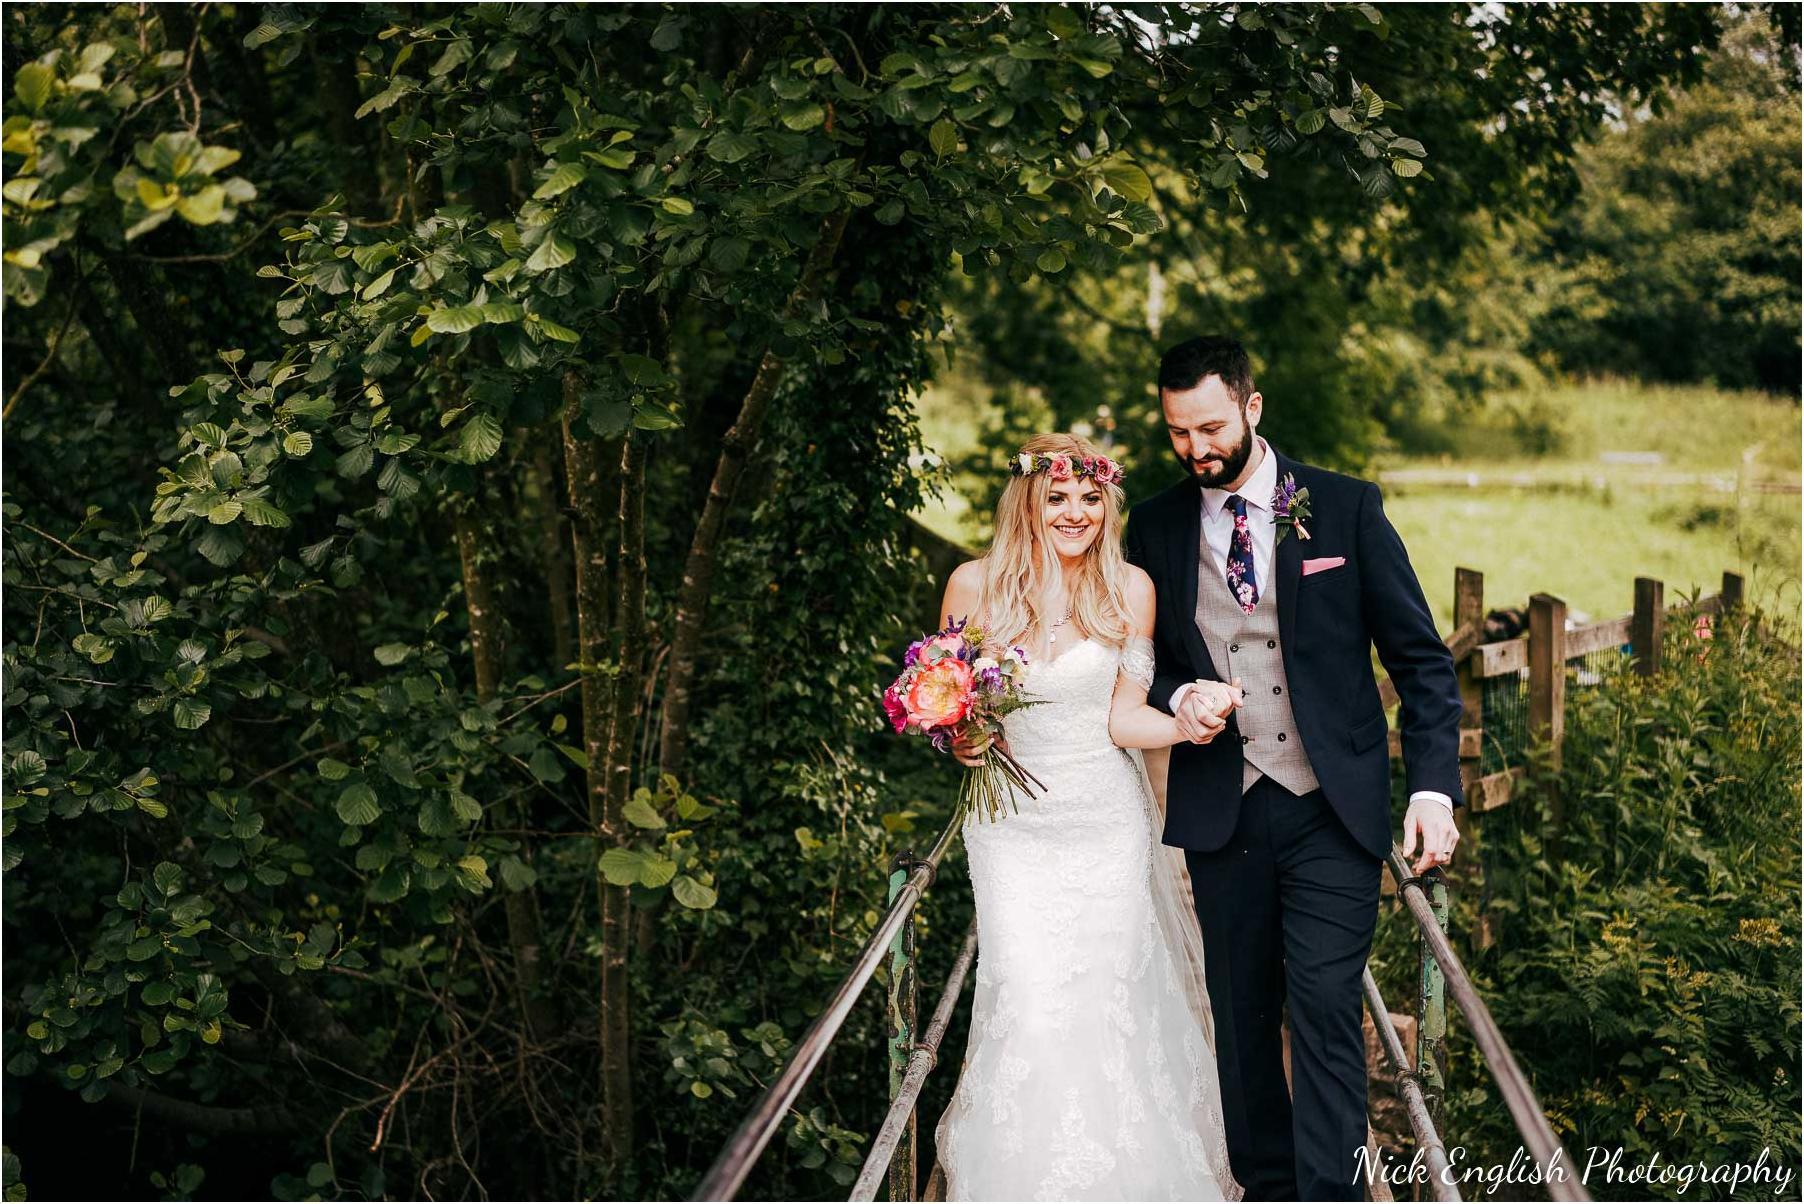 Whitebottom_Farm_Wedding_Manchester_Photograph-43.jpg